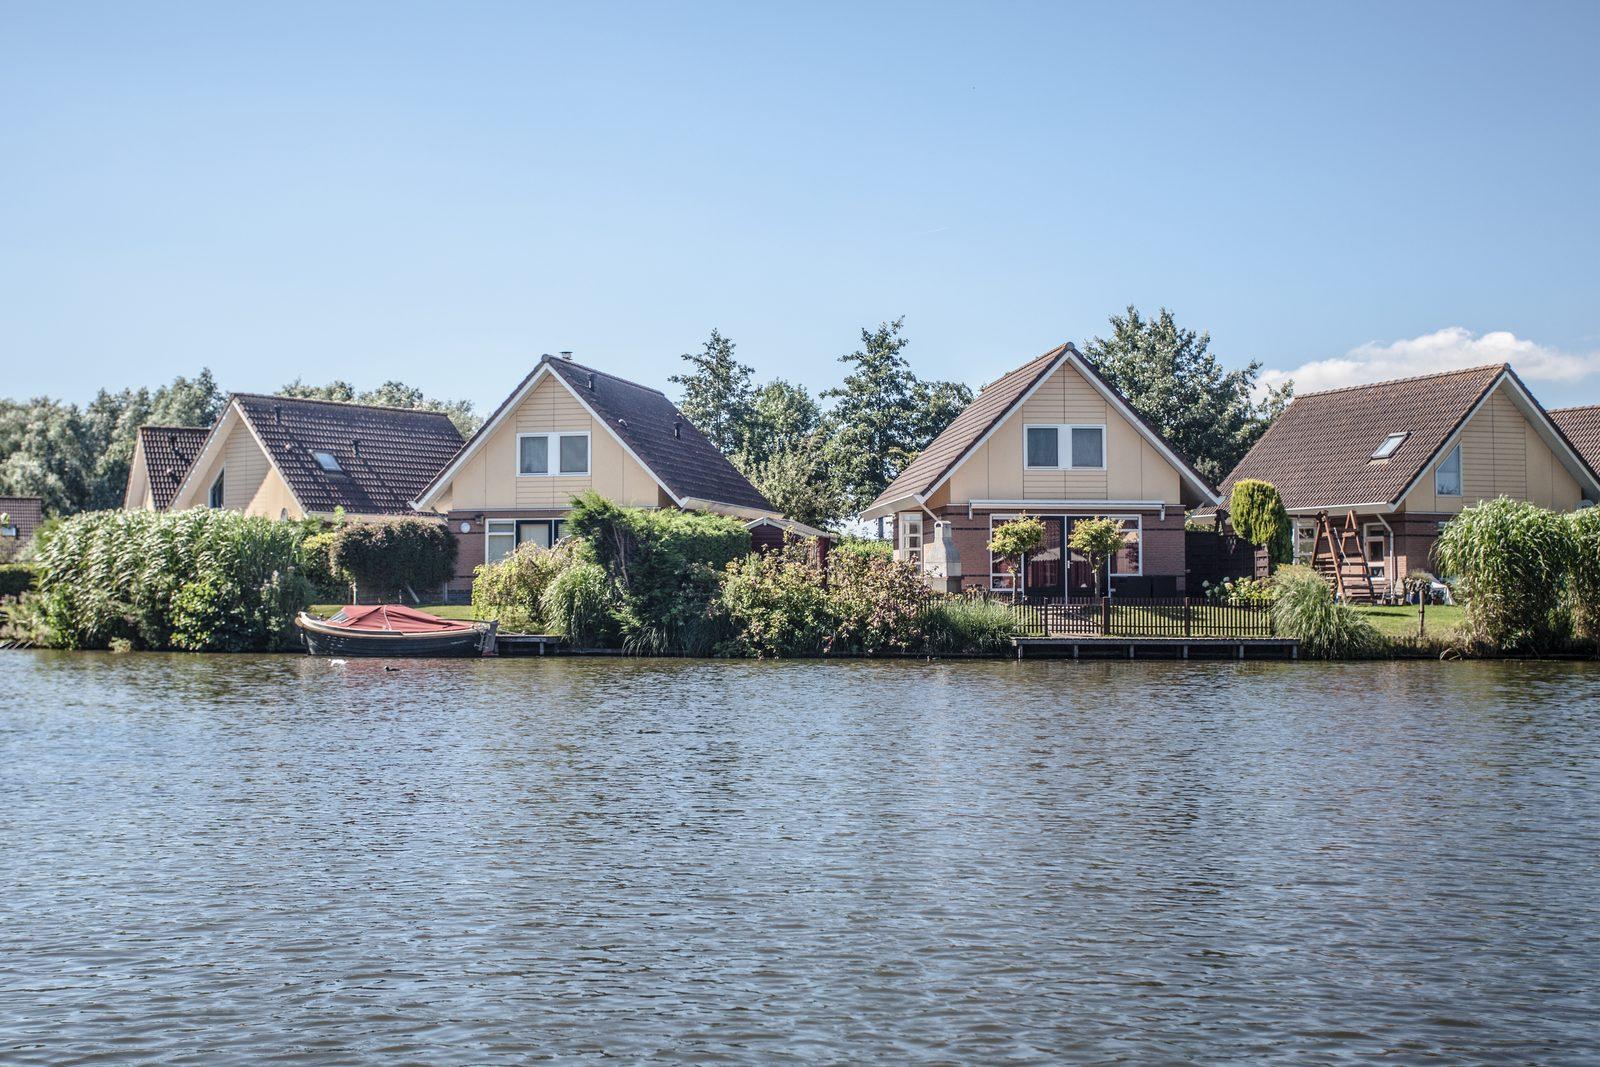 Wochenendausflug Nord-Holland